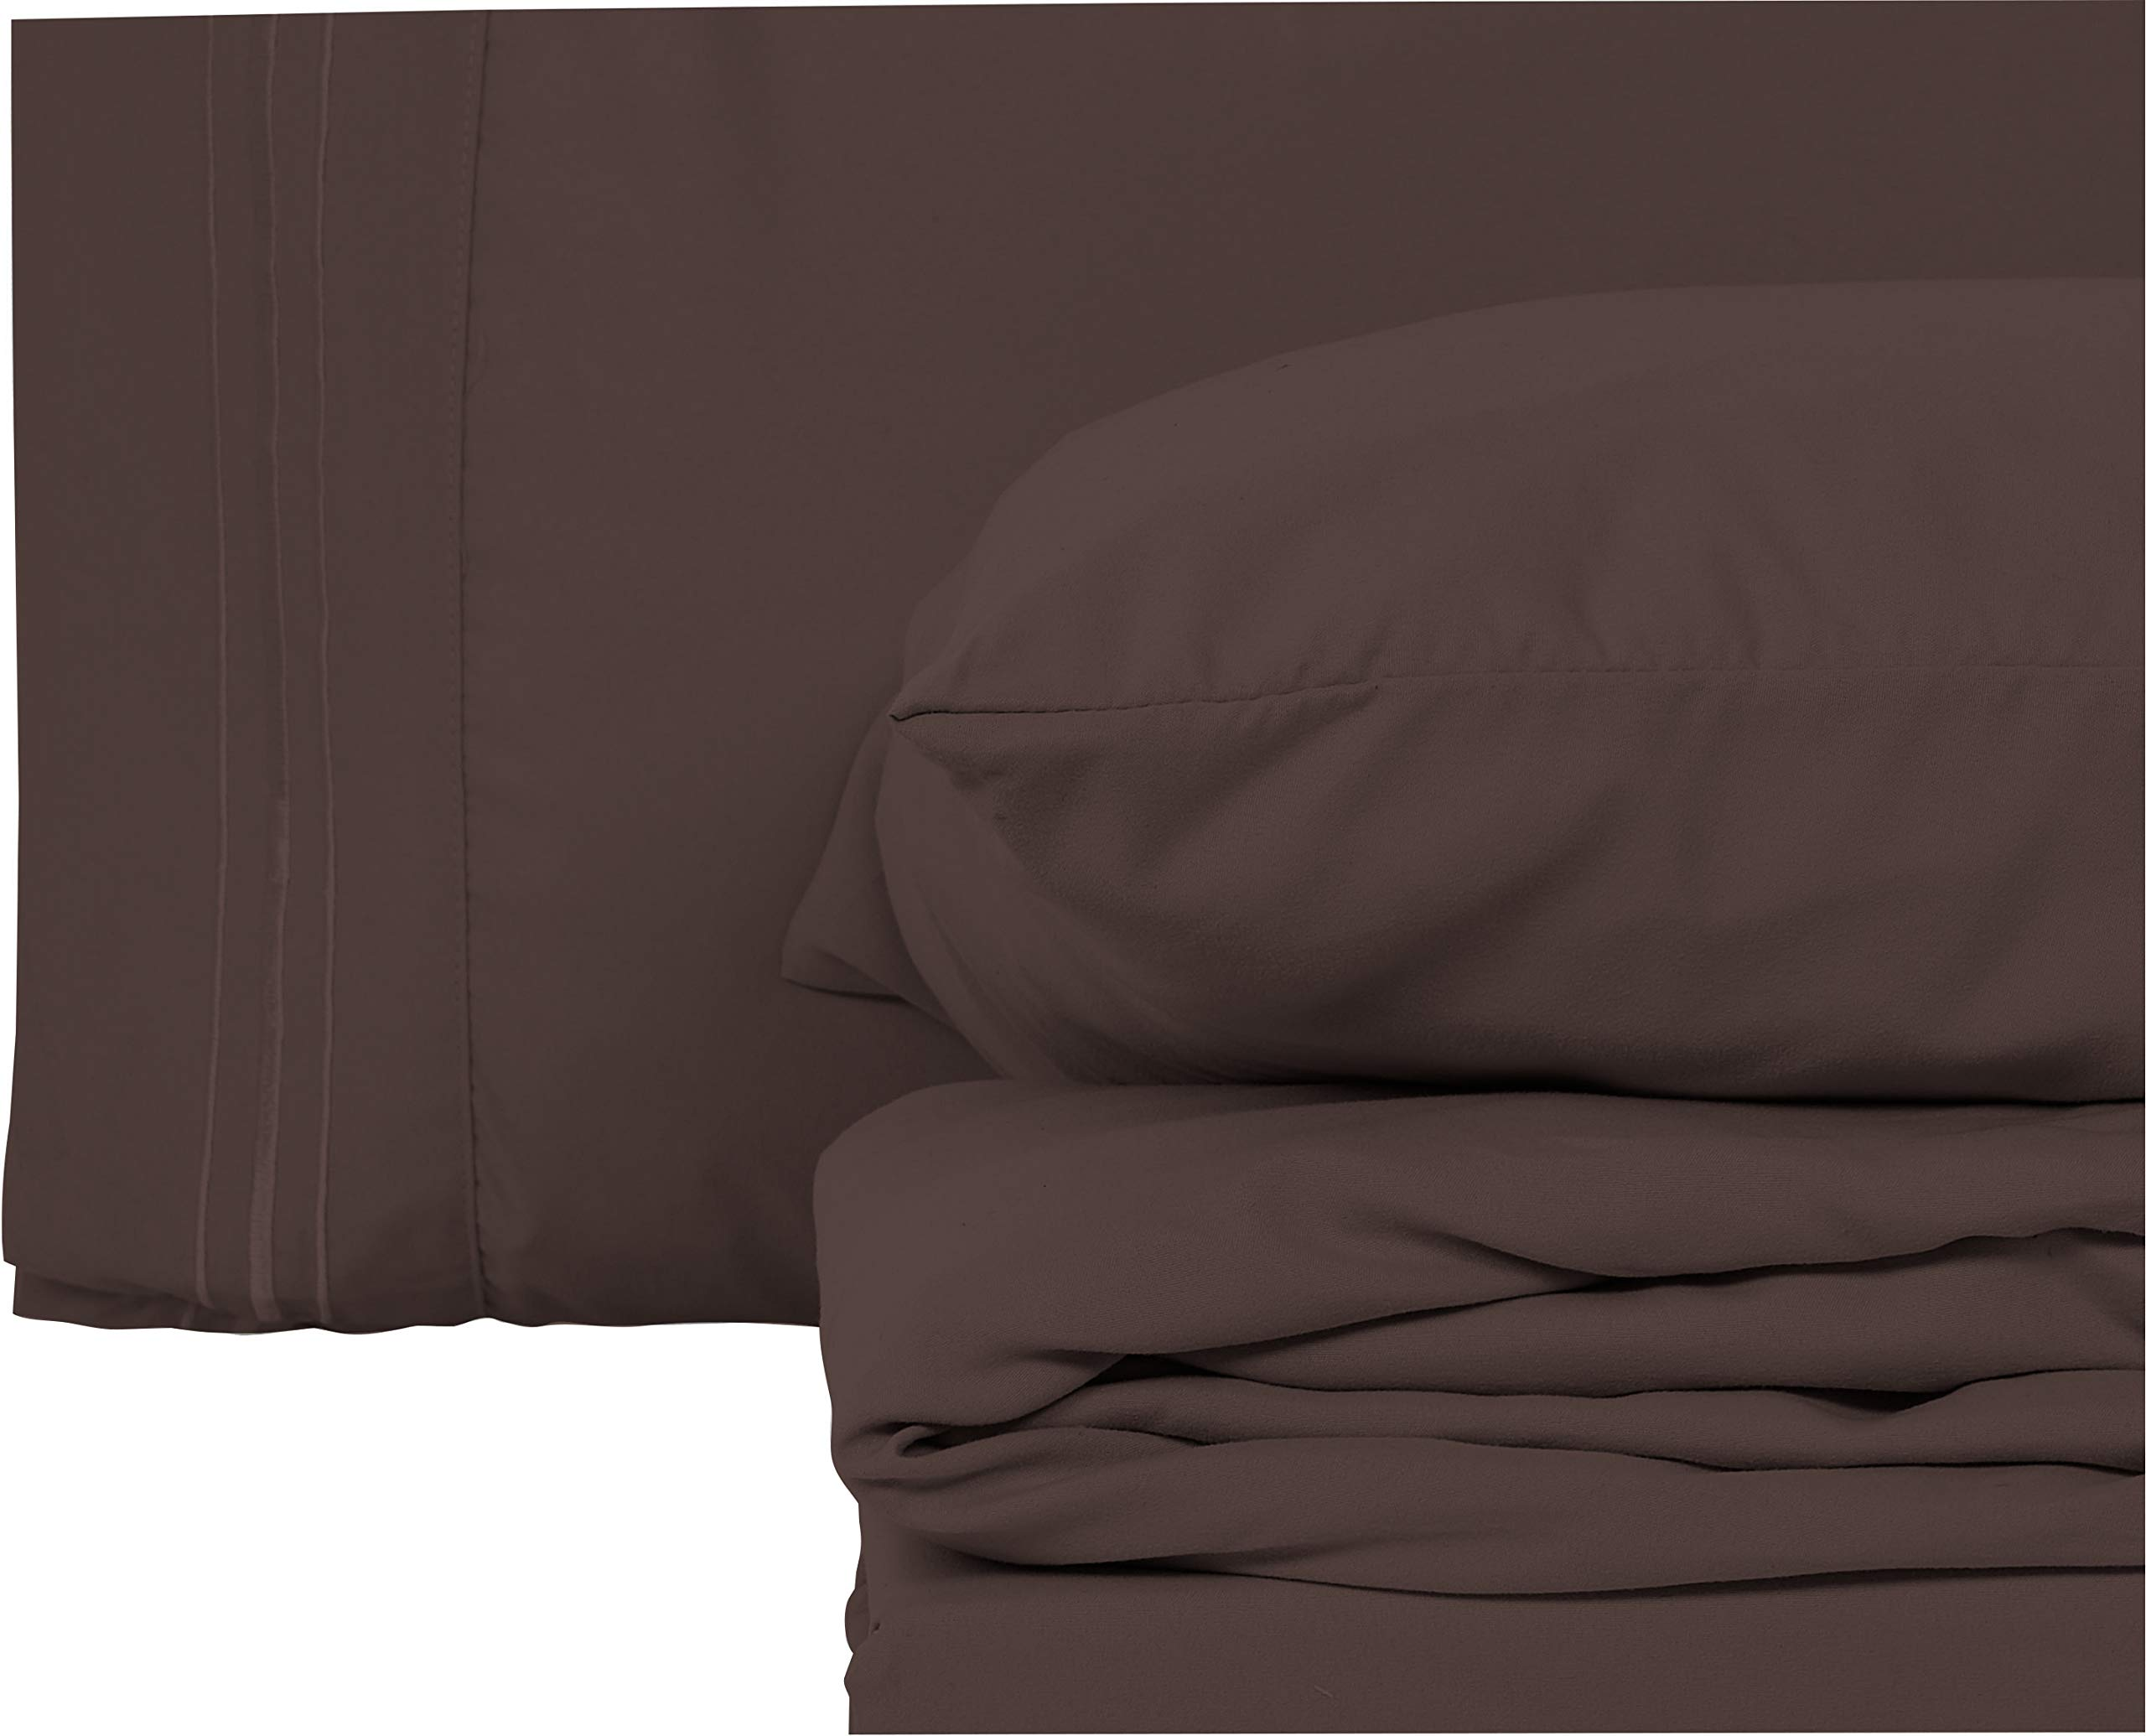 Style Basics Super Soft Brushed Microfiber Bed Sheet Set - 1800 Series Easy-Clean (Brown, Full)